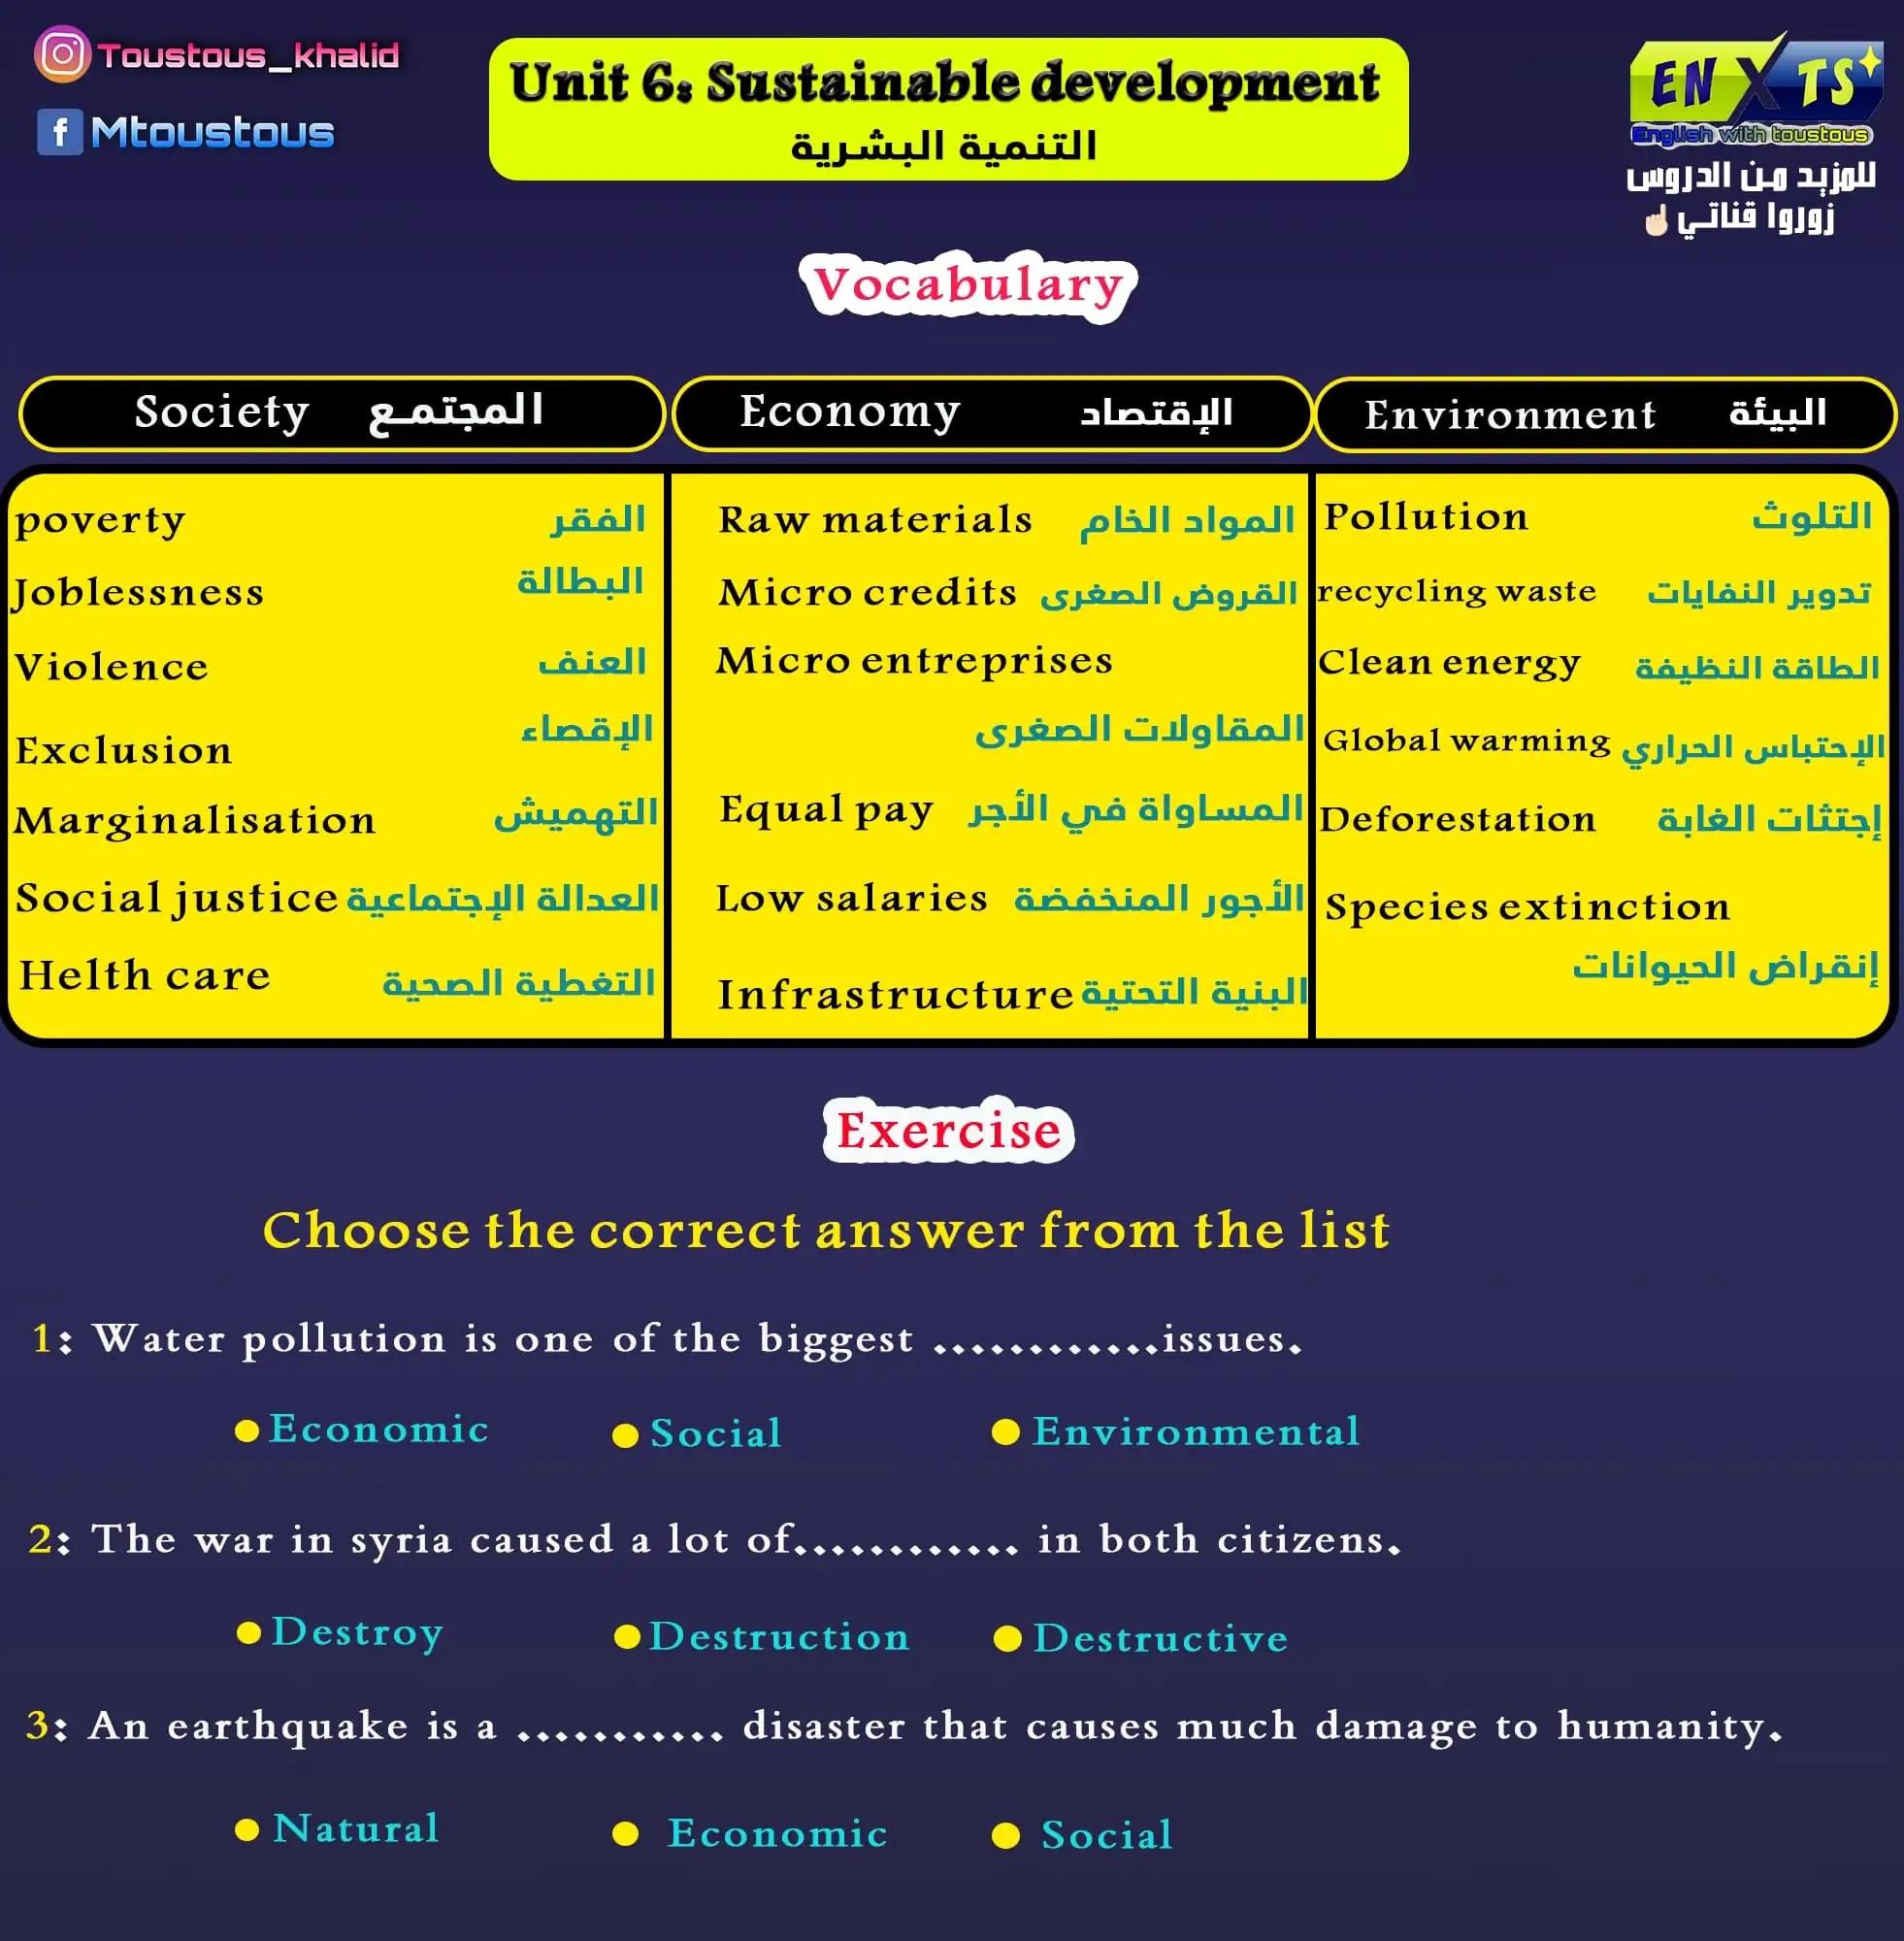 unit 6: sustainable development